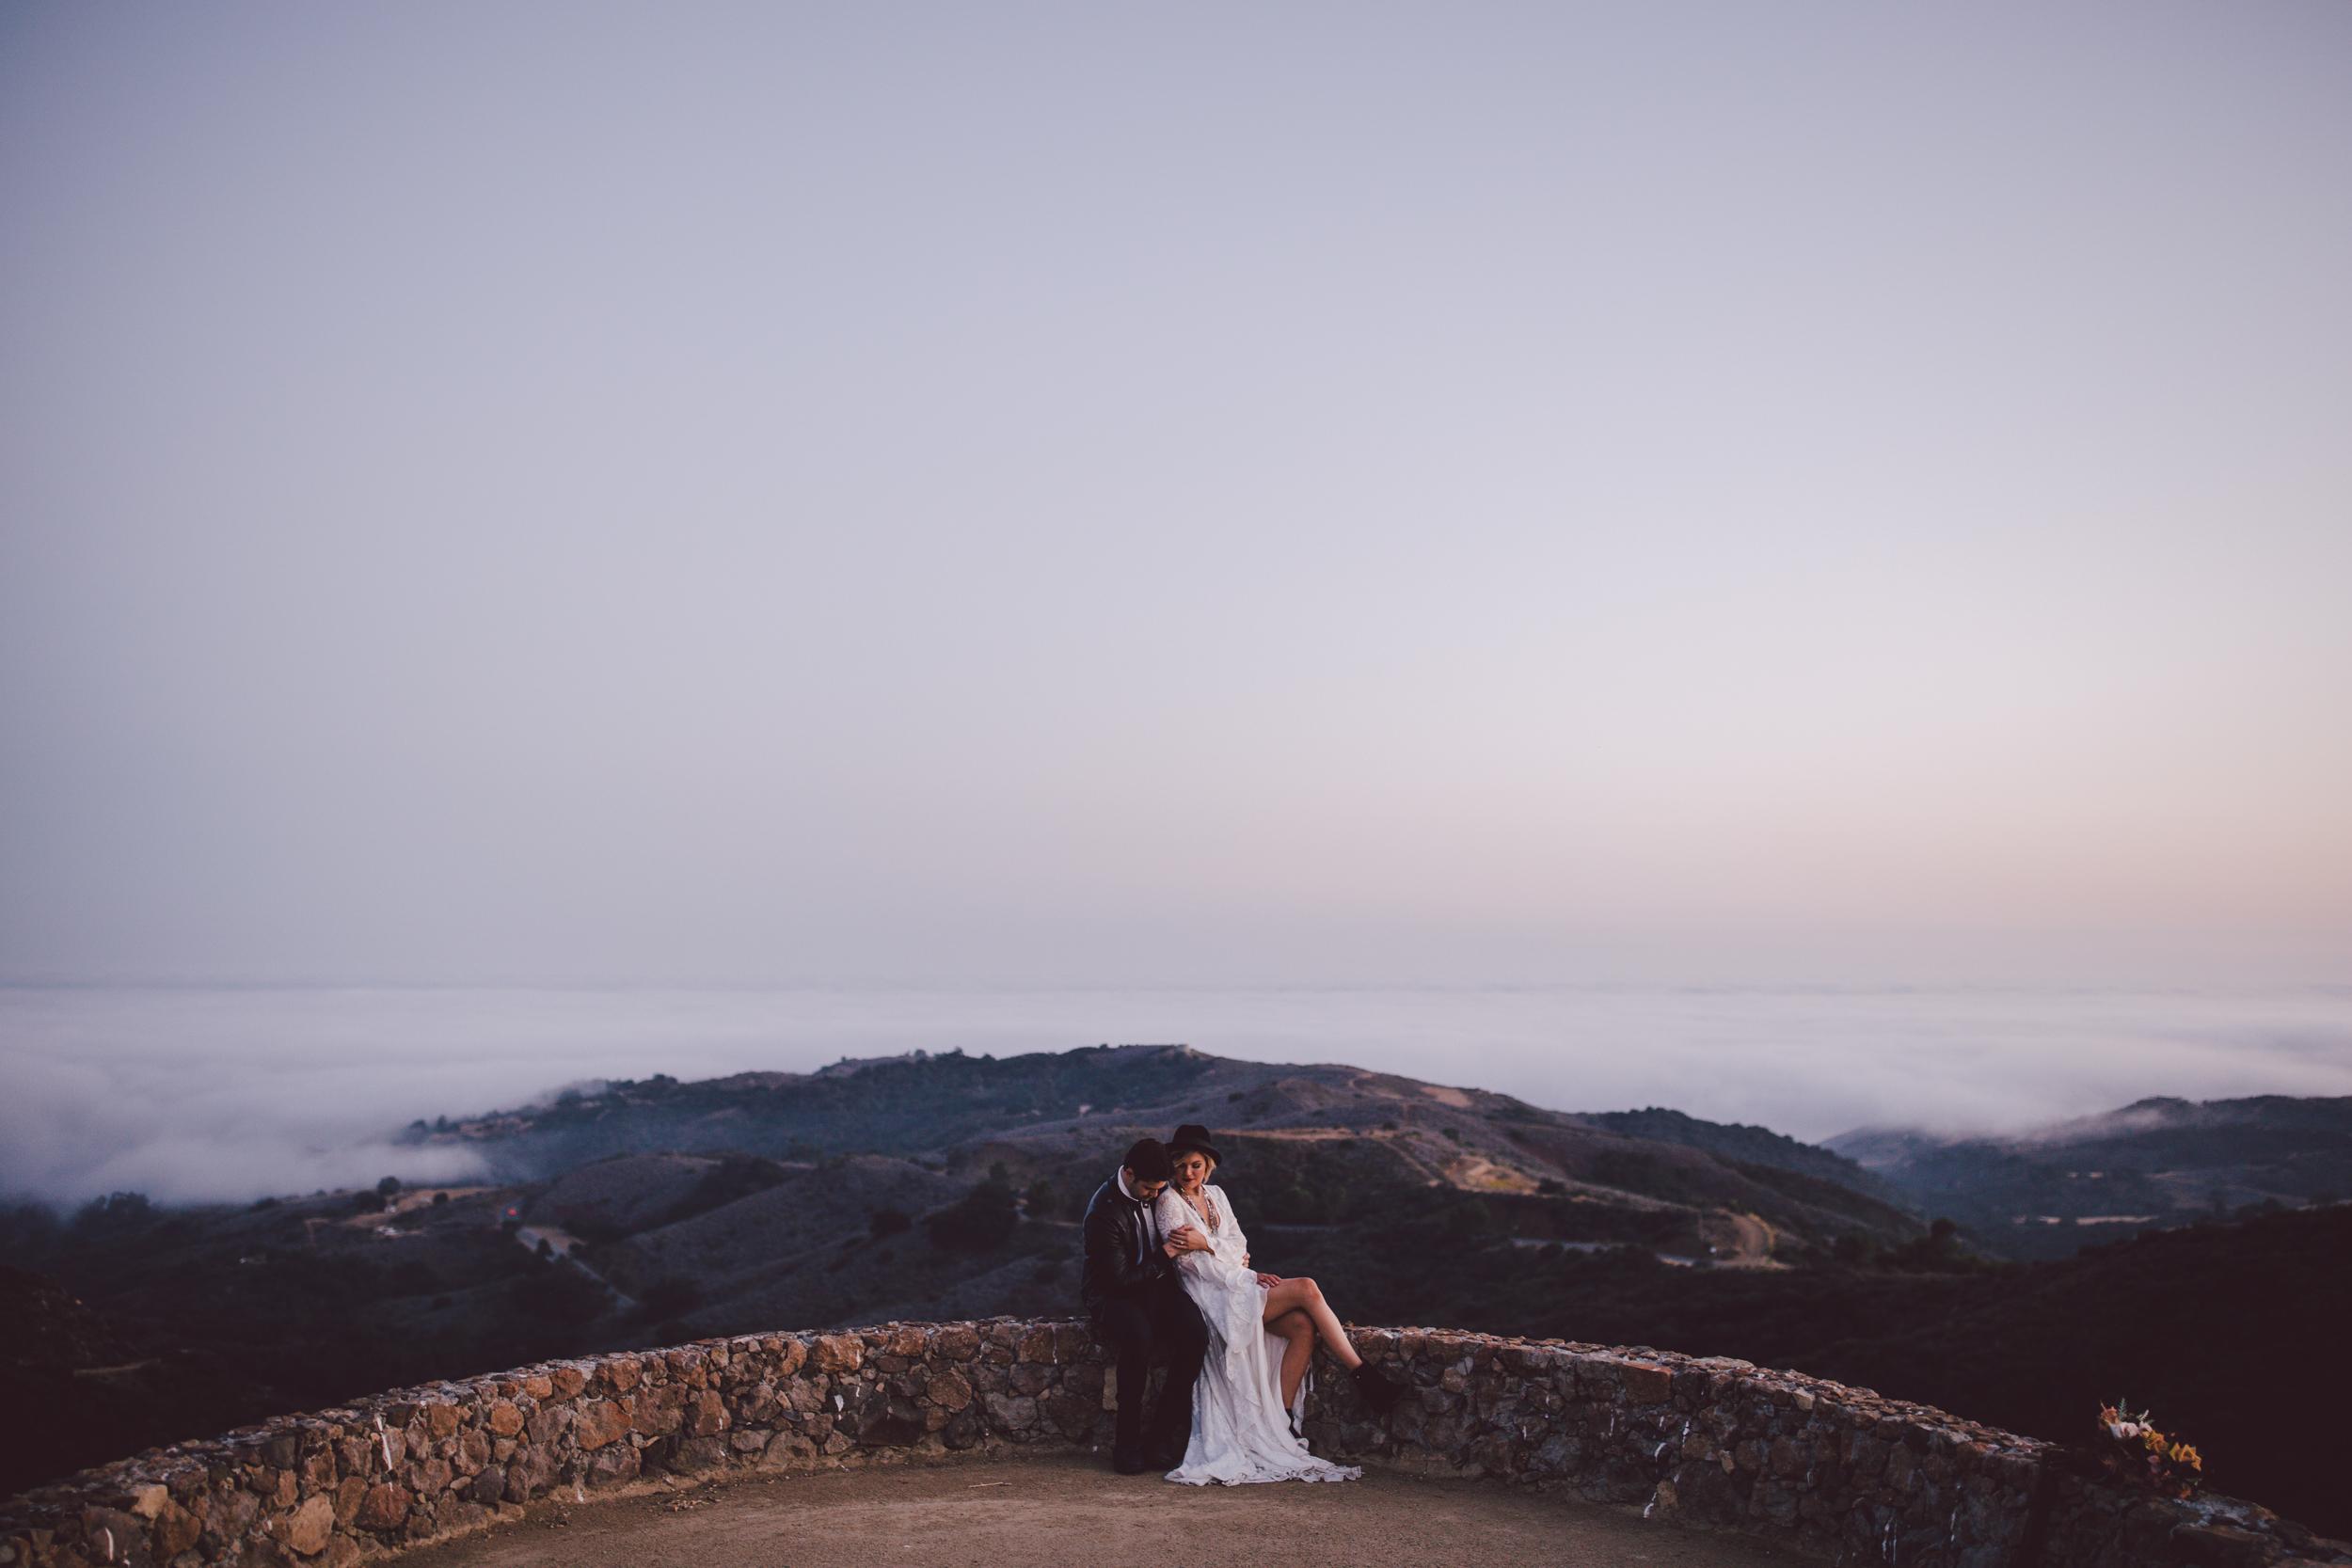 stonewall ranch-moody-romantic-wedding-malibu-adventure